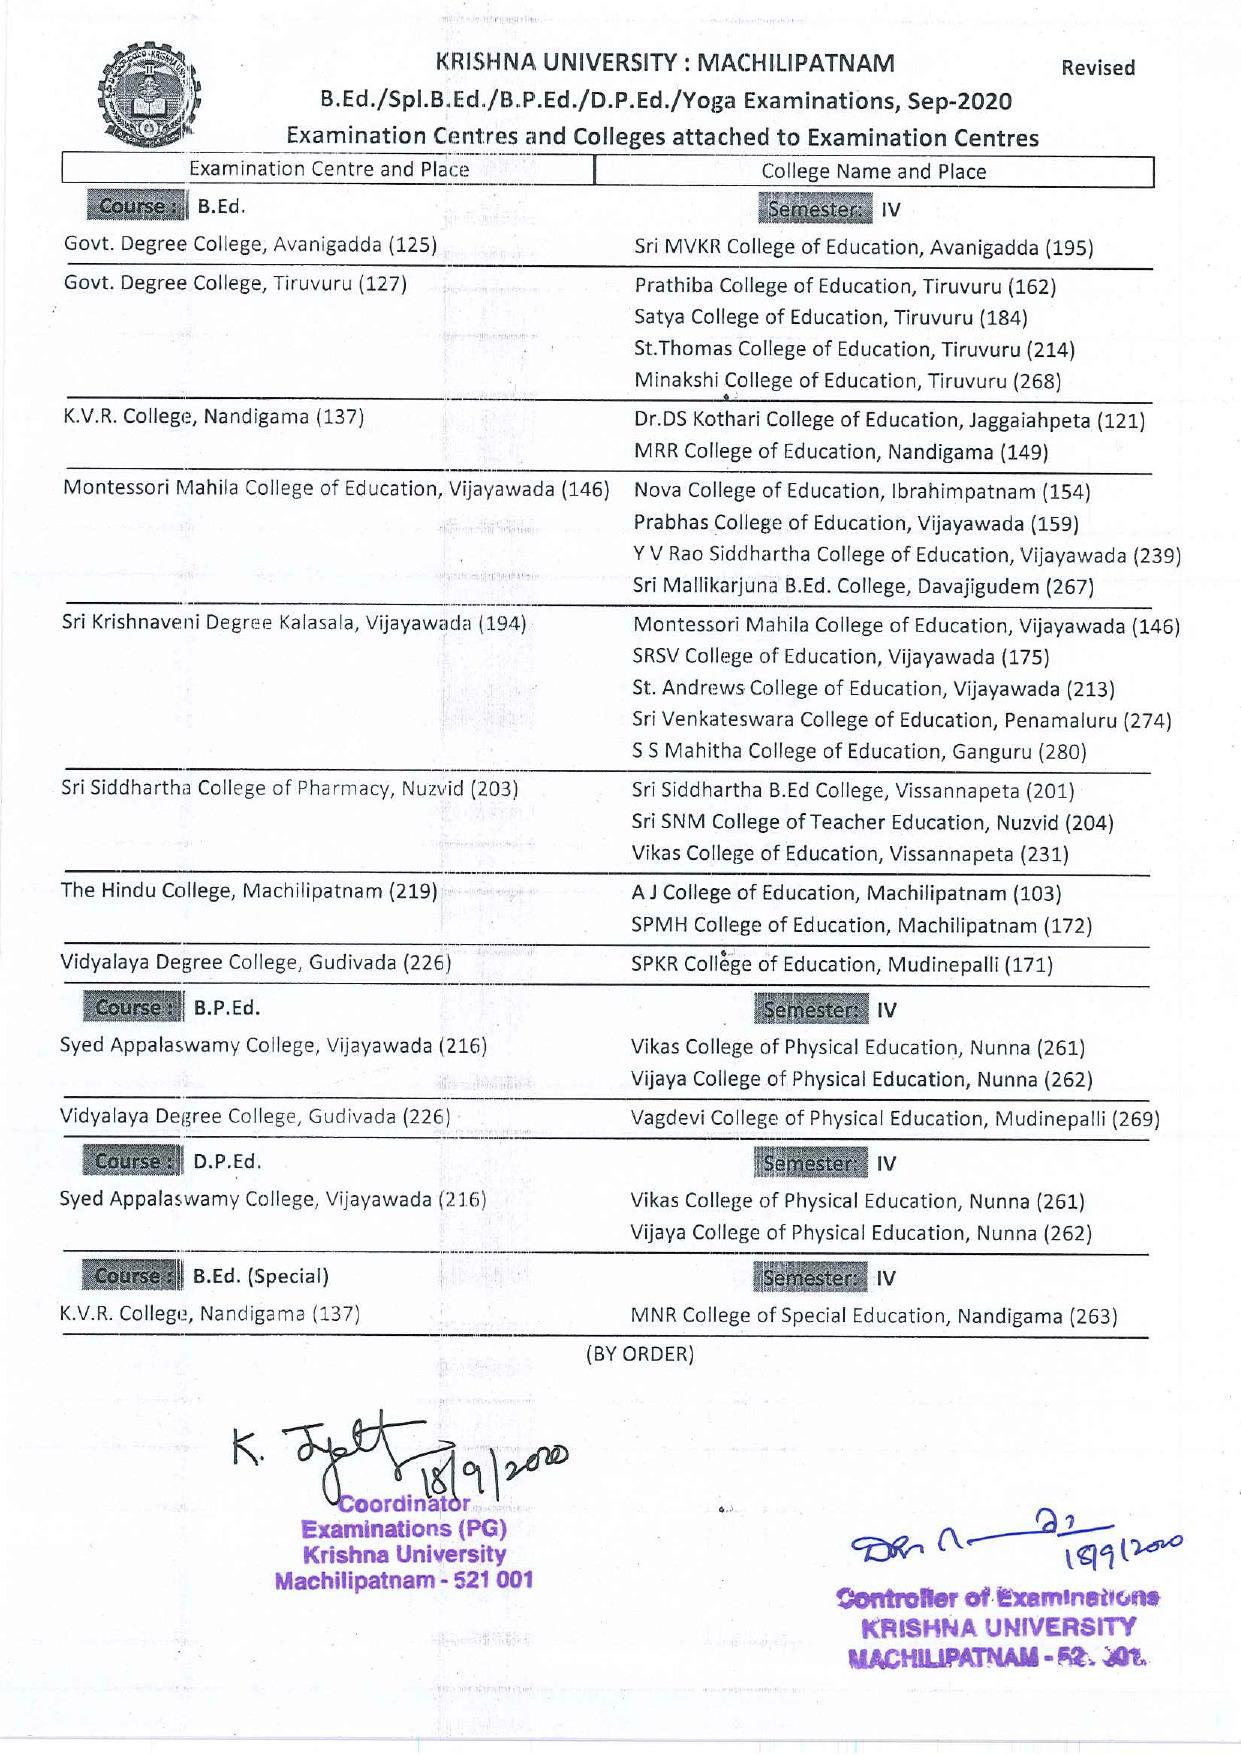 Krishna University B.Ed,Spl B.Ed,BP.Ed & DP.Ed 4th Sem Sep 2020 Exam Centers